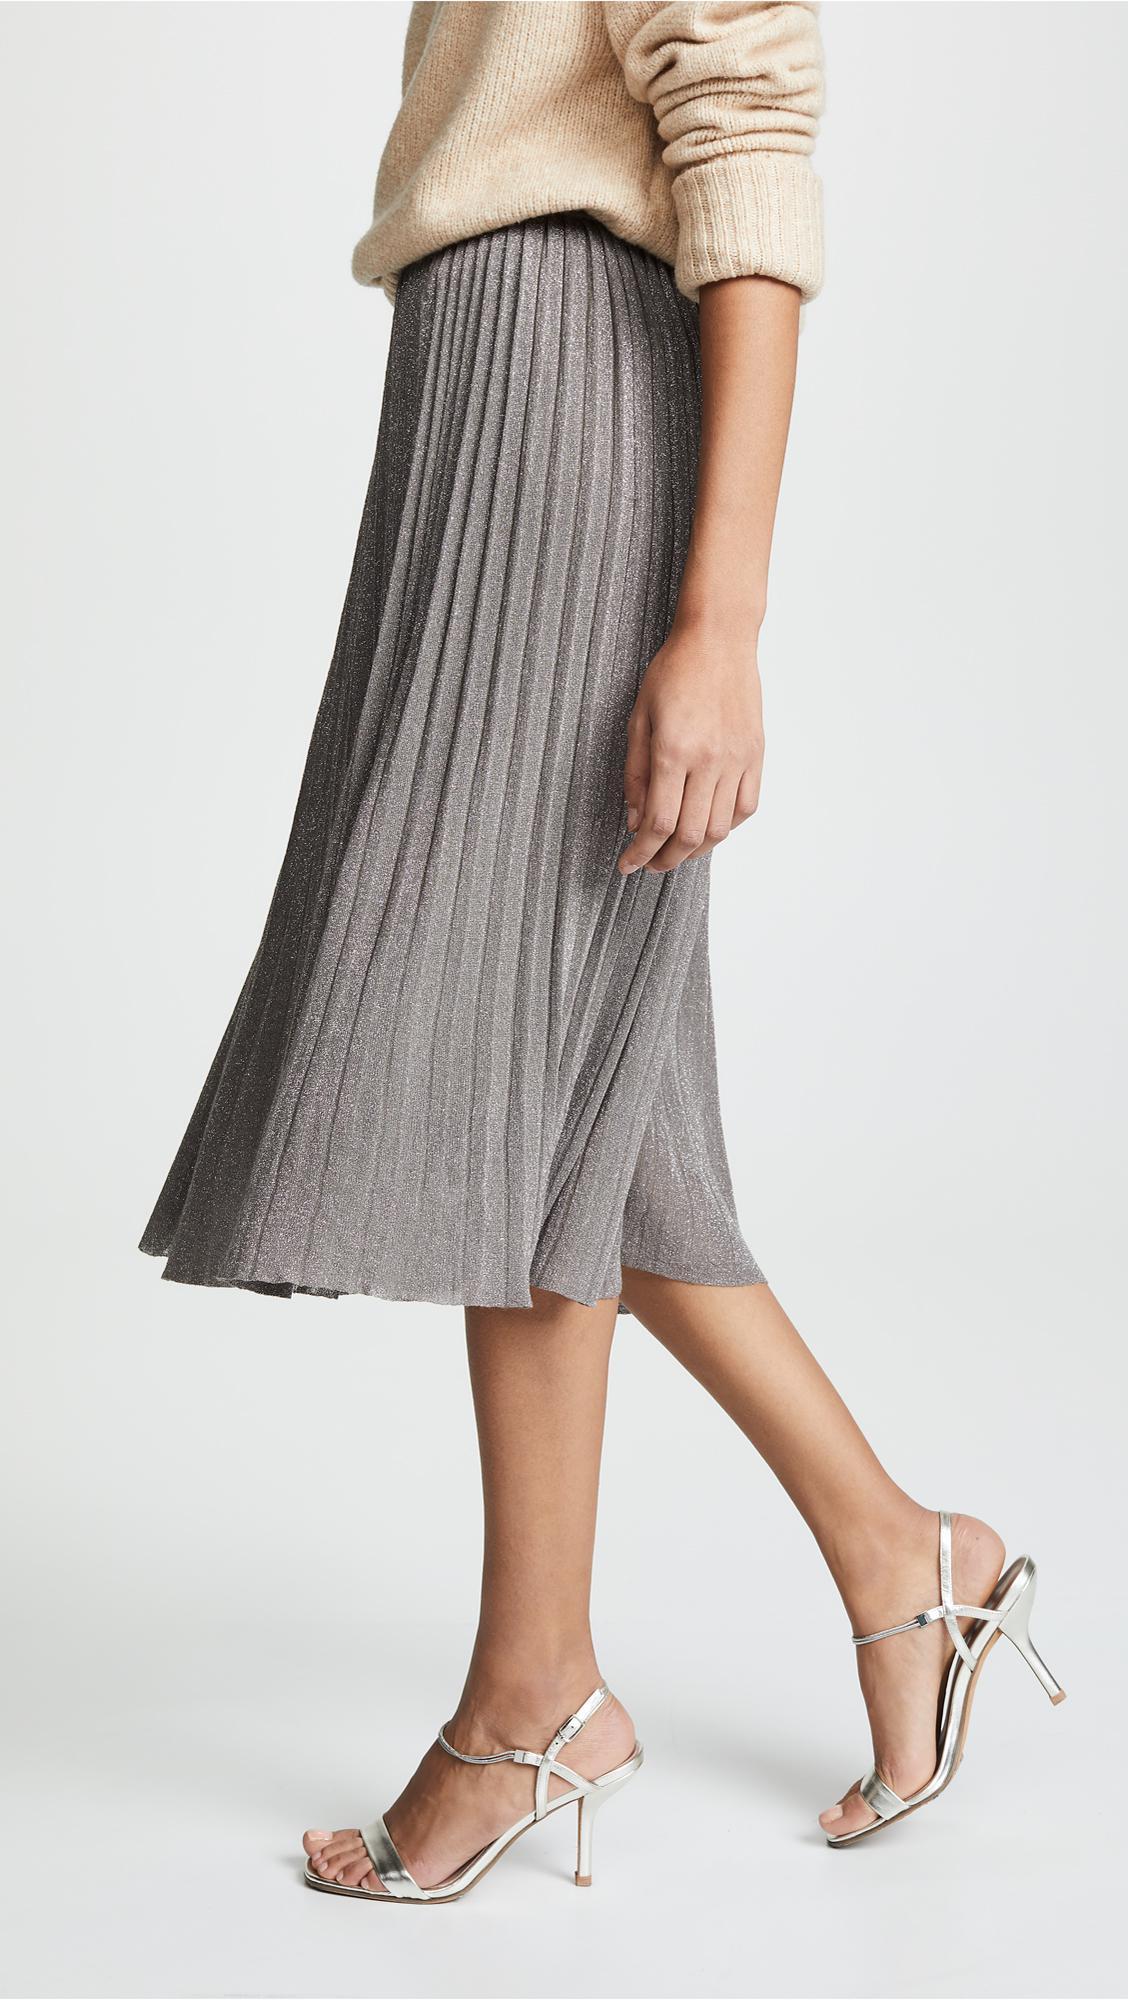 200c51ce7f Club Monaco Tilli Pleated Metallic Pull-on Skirt in Gray - Lyst